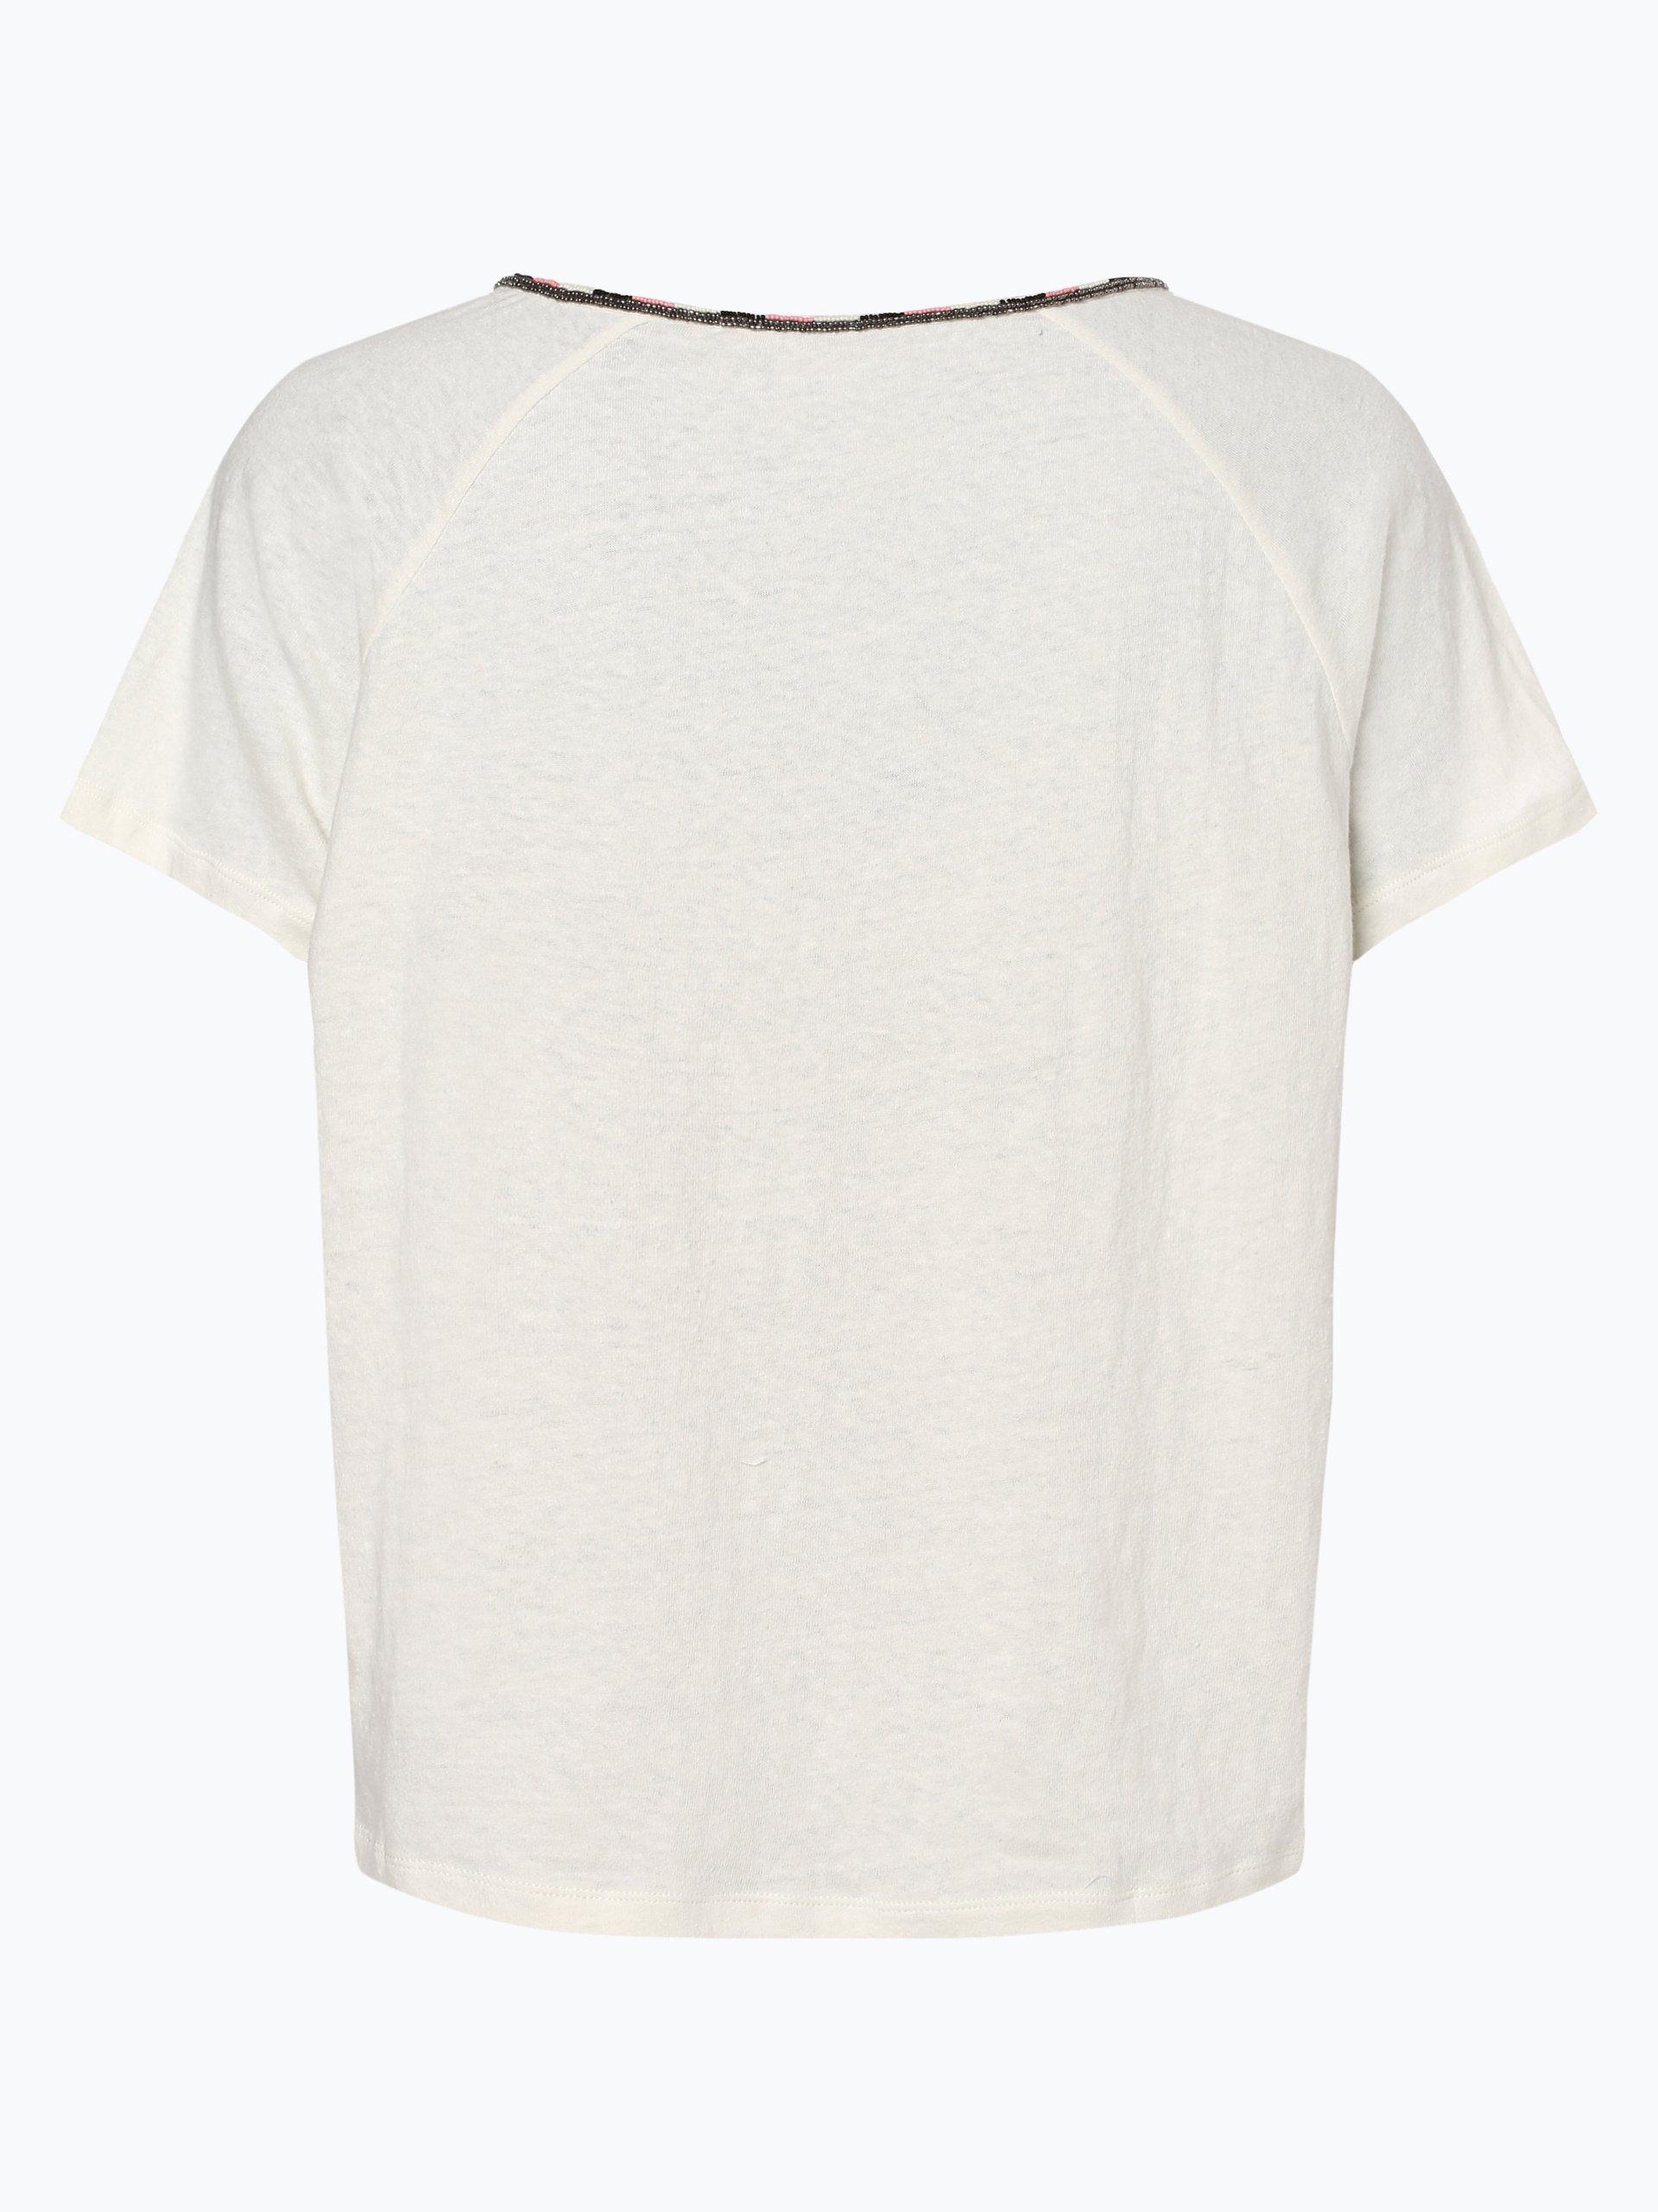 Pepe Jeans Damen T-Shirt - Mertyl